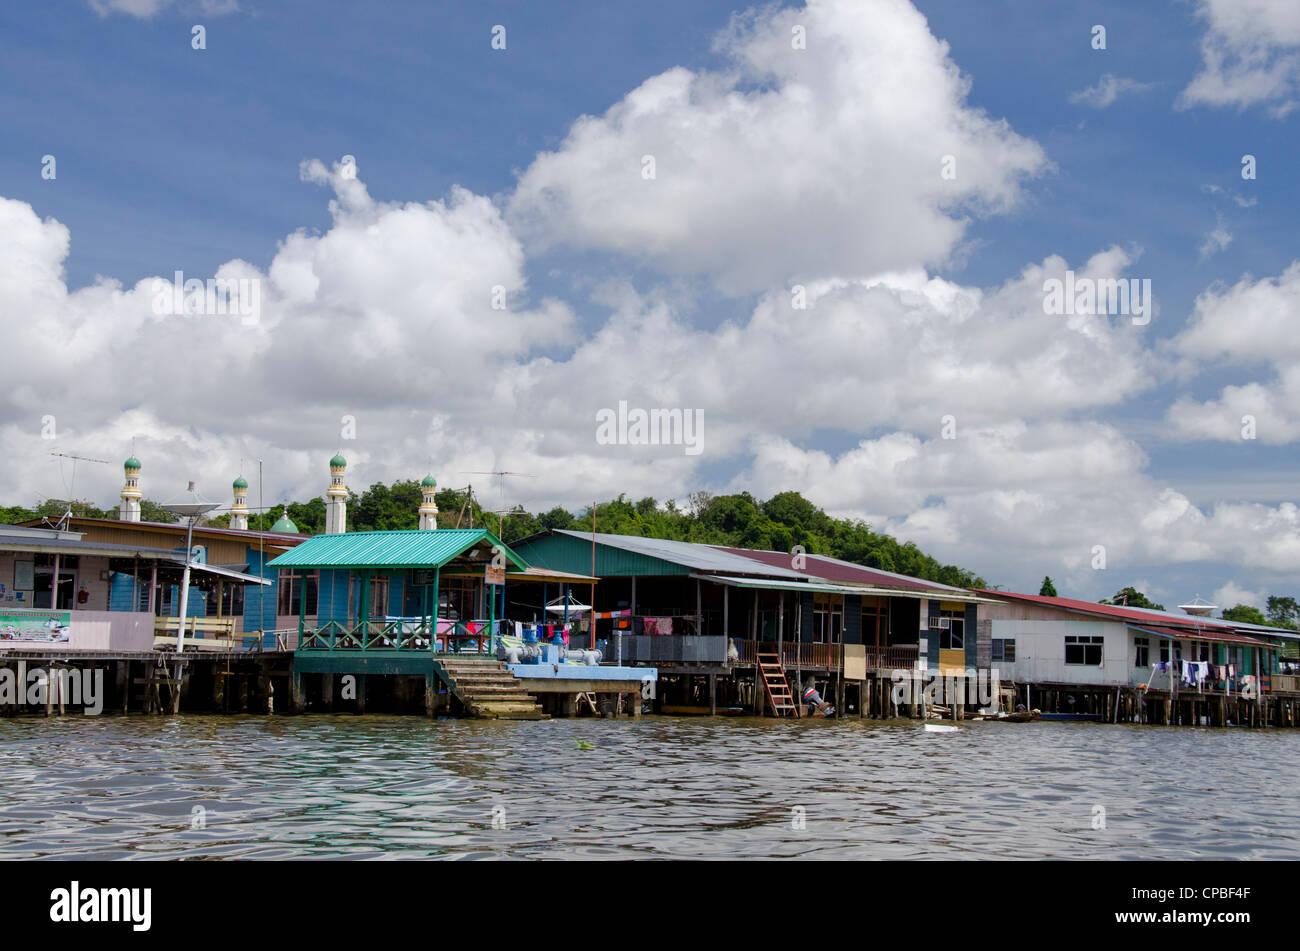 Asia, Borneo, Brunei Darussalam, Bandar Seri Begawan. Historic Water Village. - Stock Image